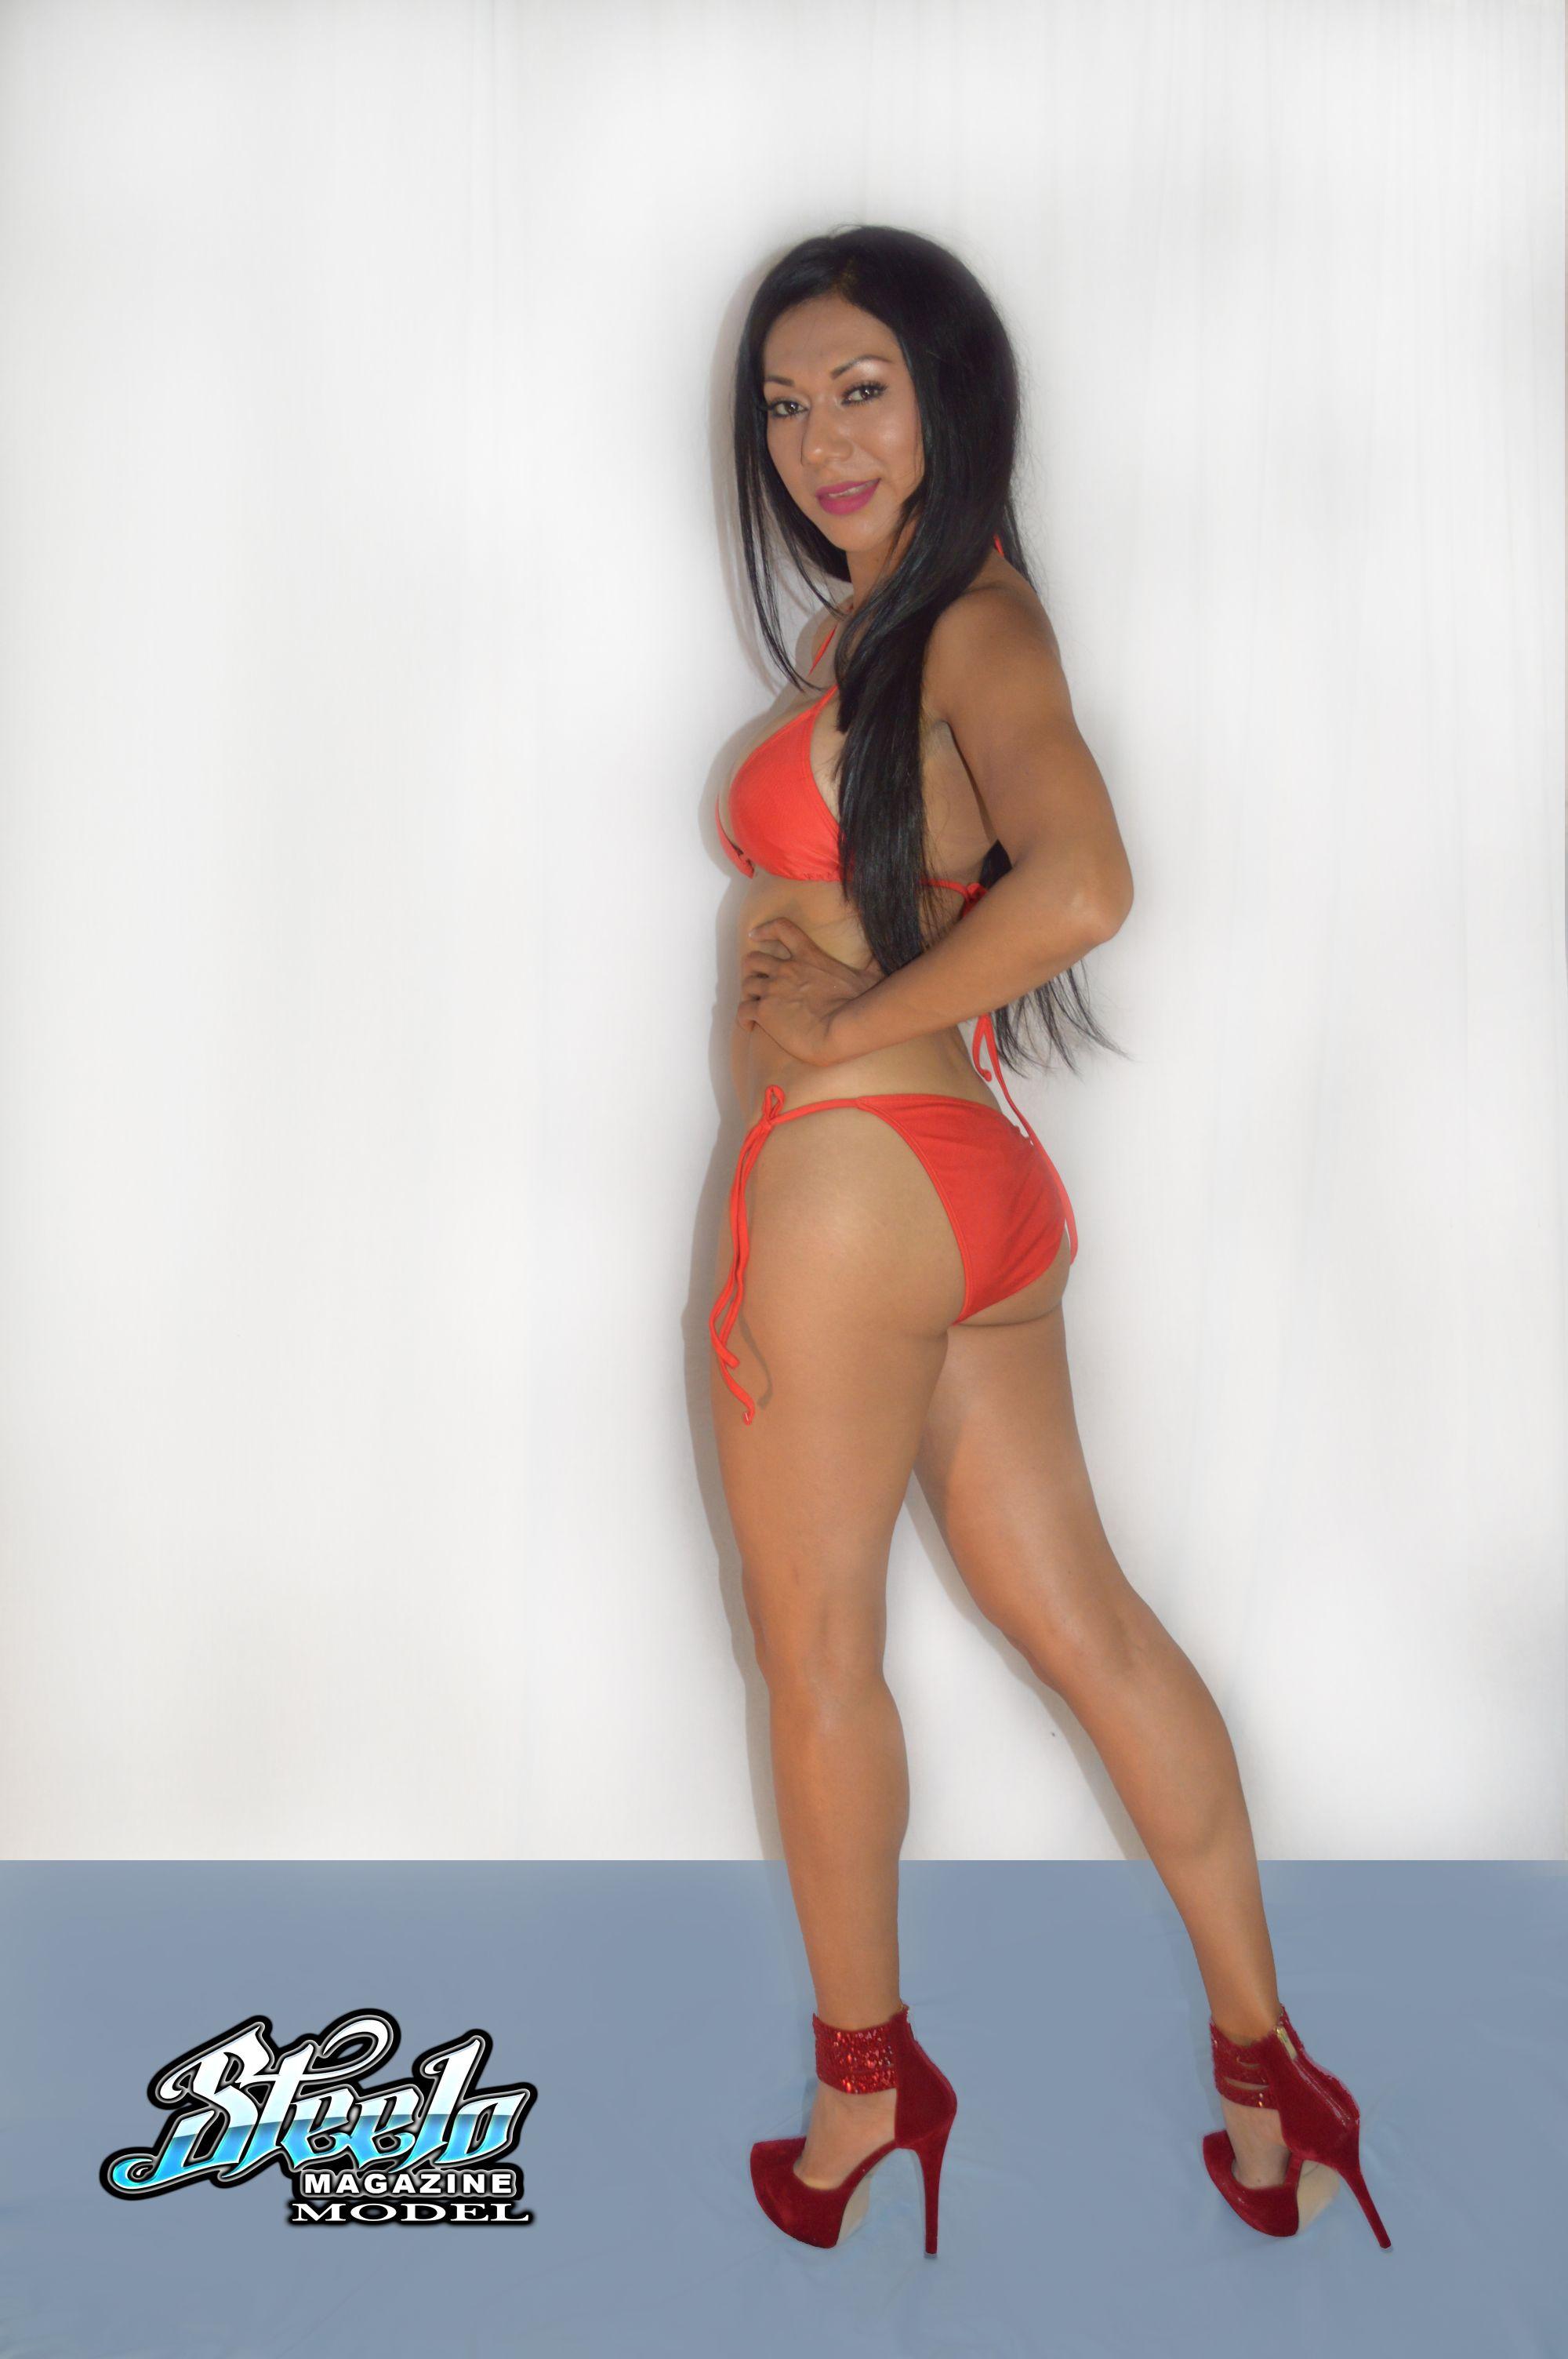 jackie-h-bikini-shoot-53